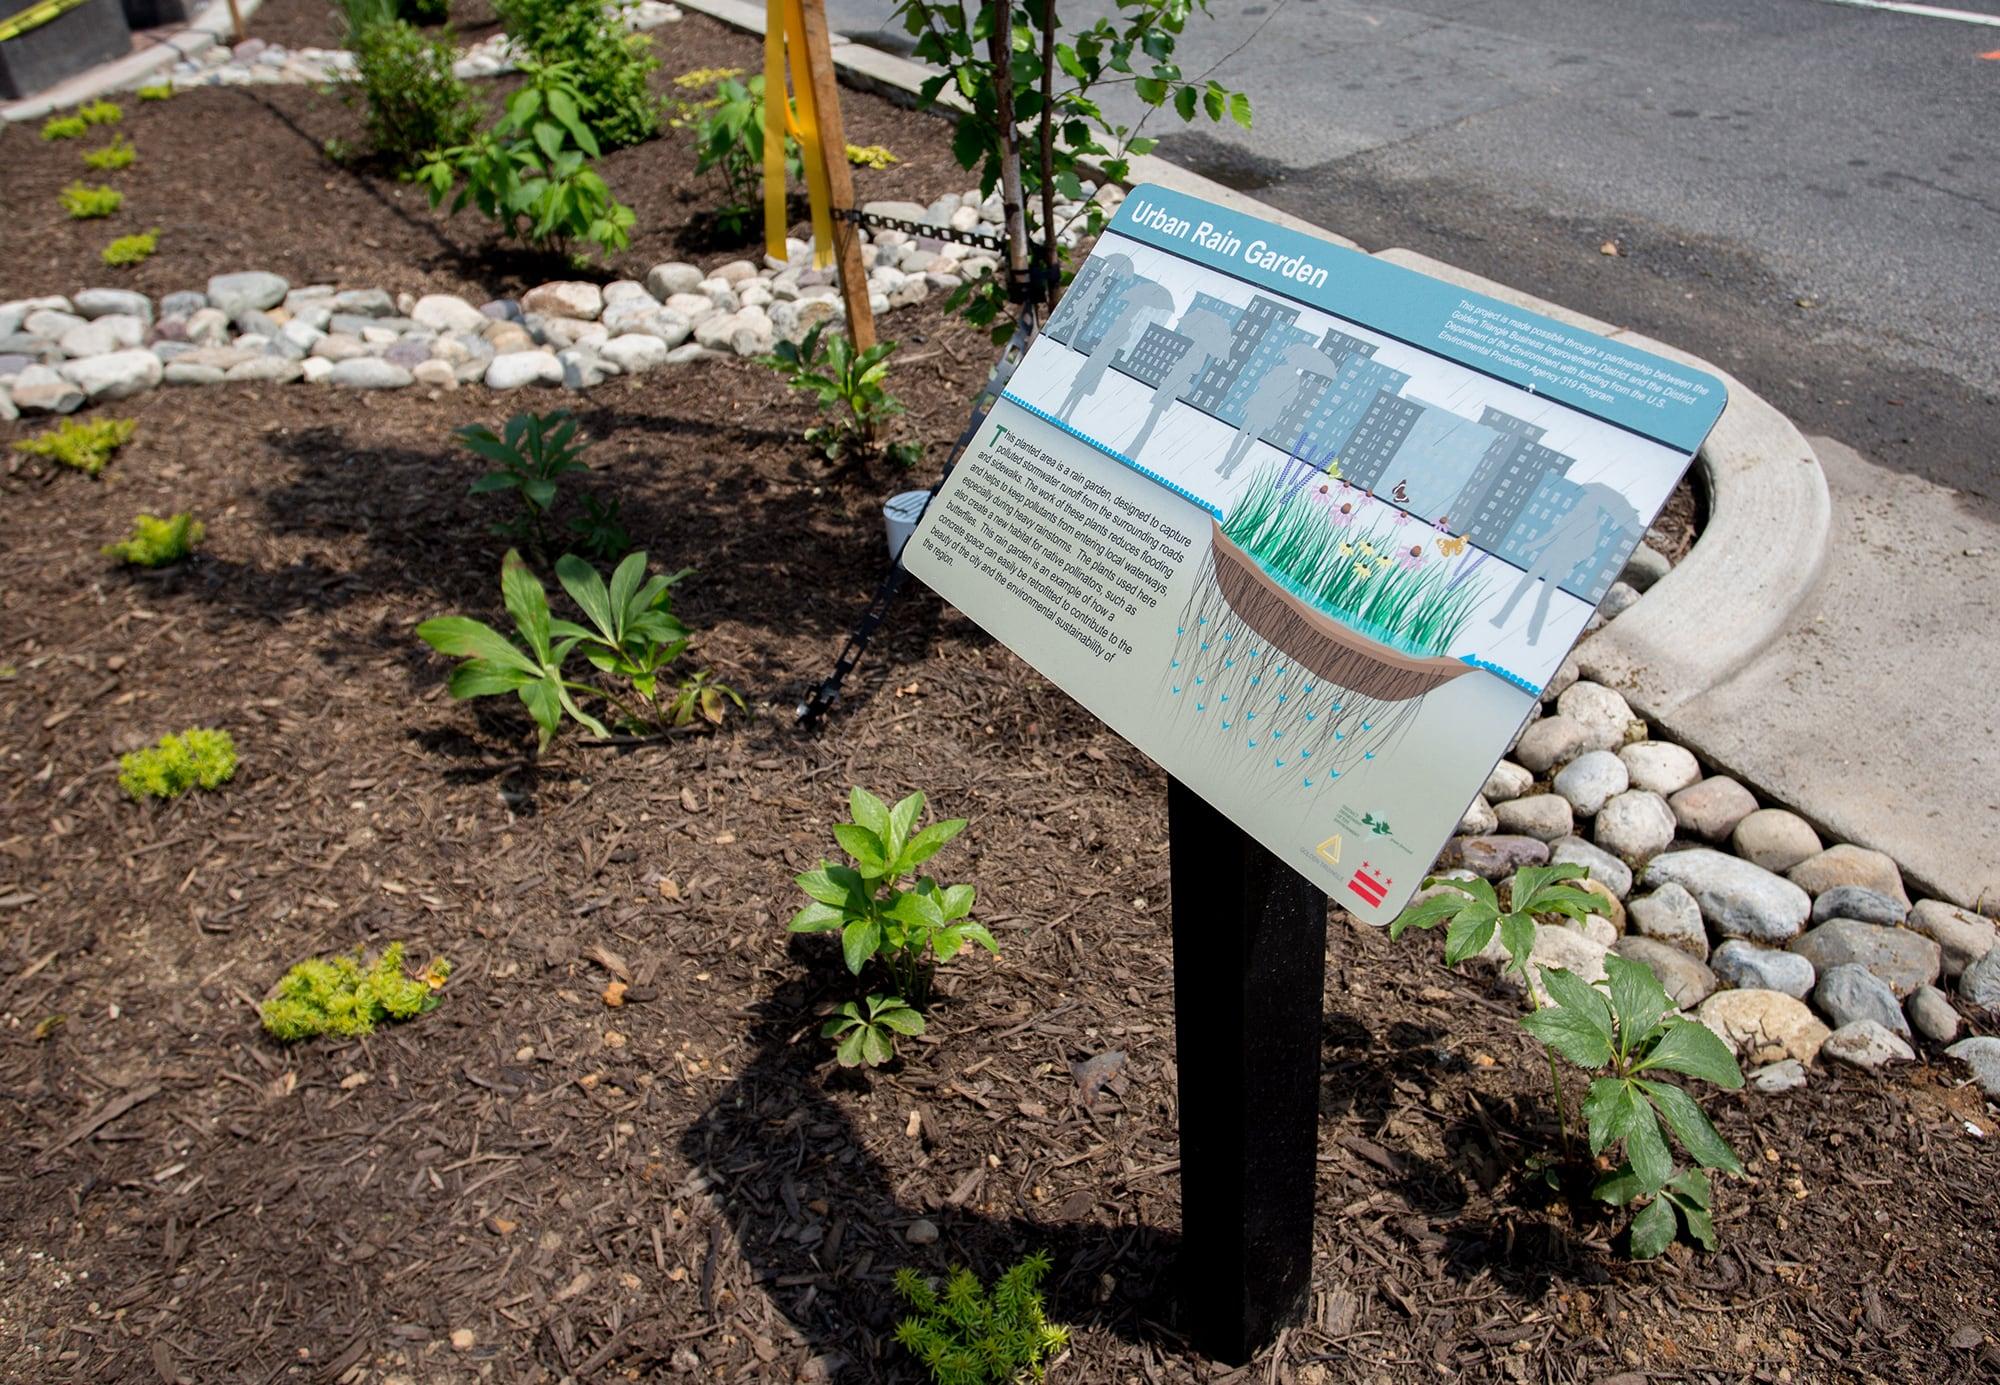 Rain Garden sign